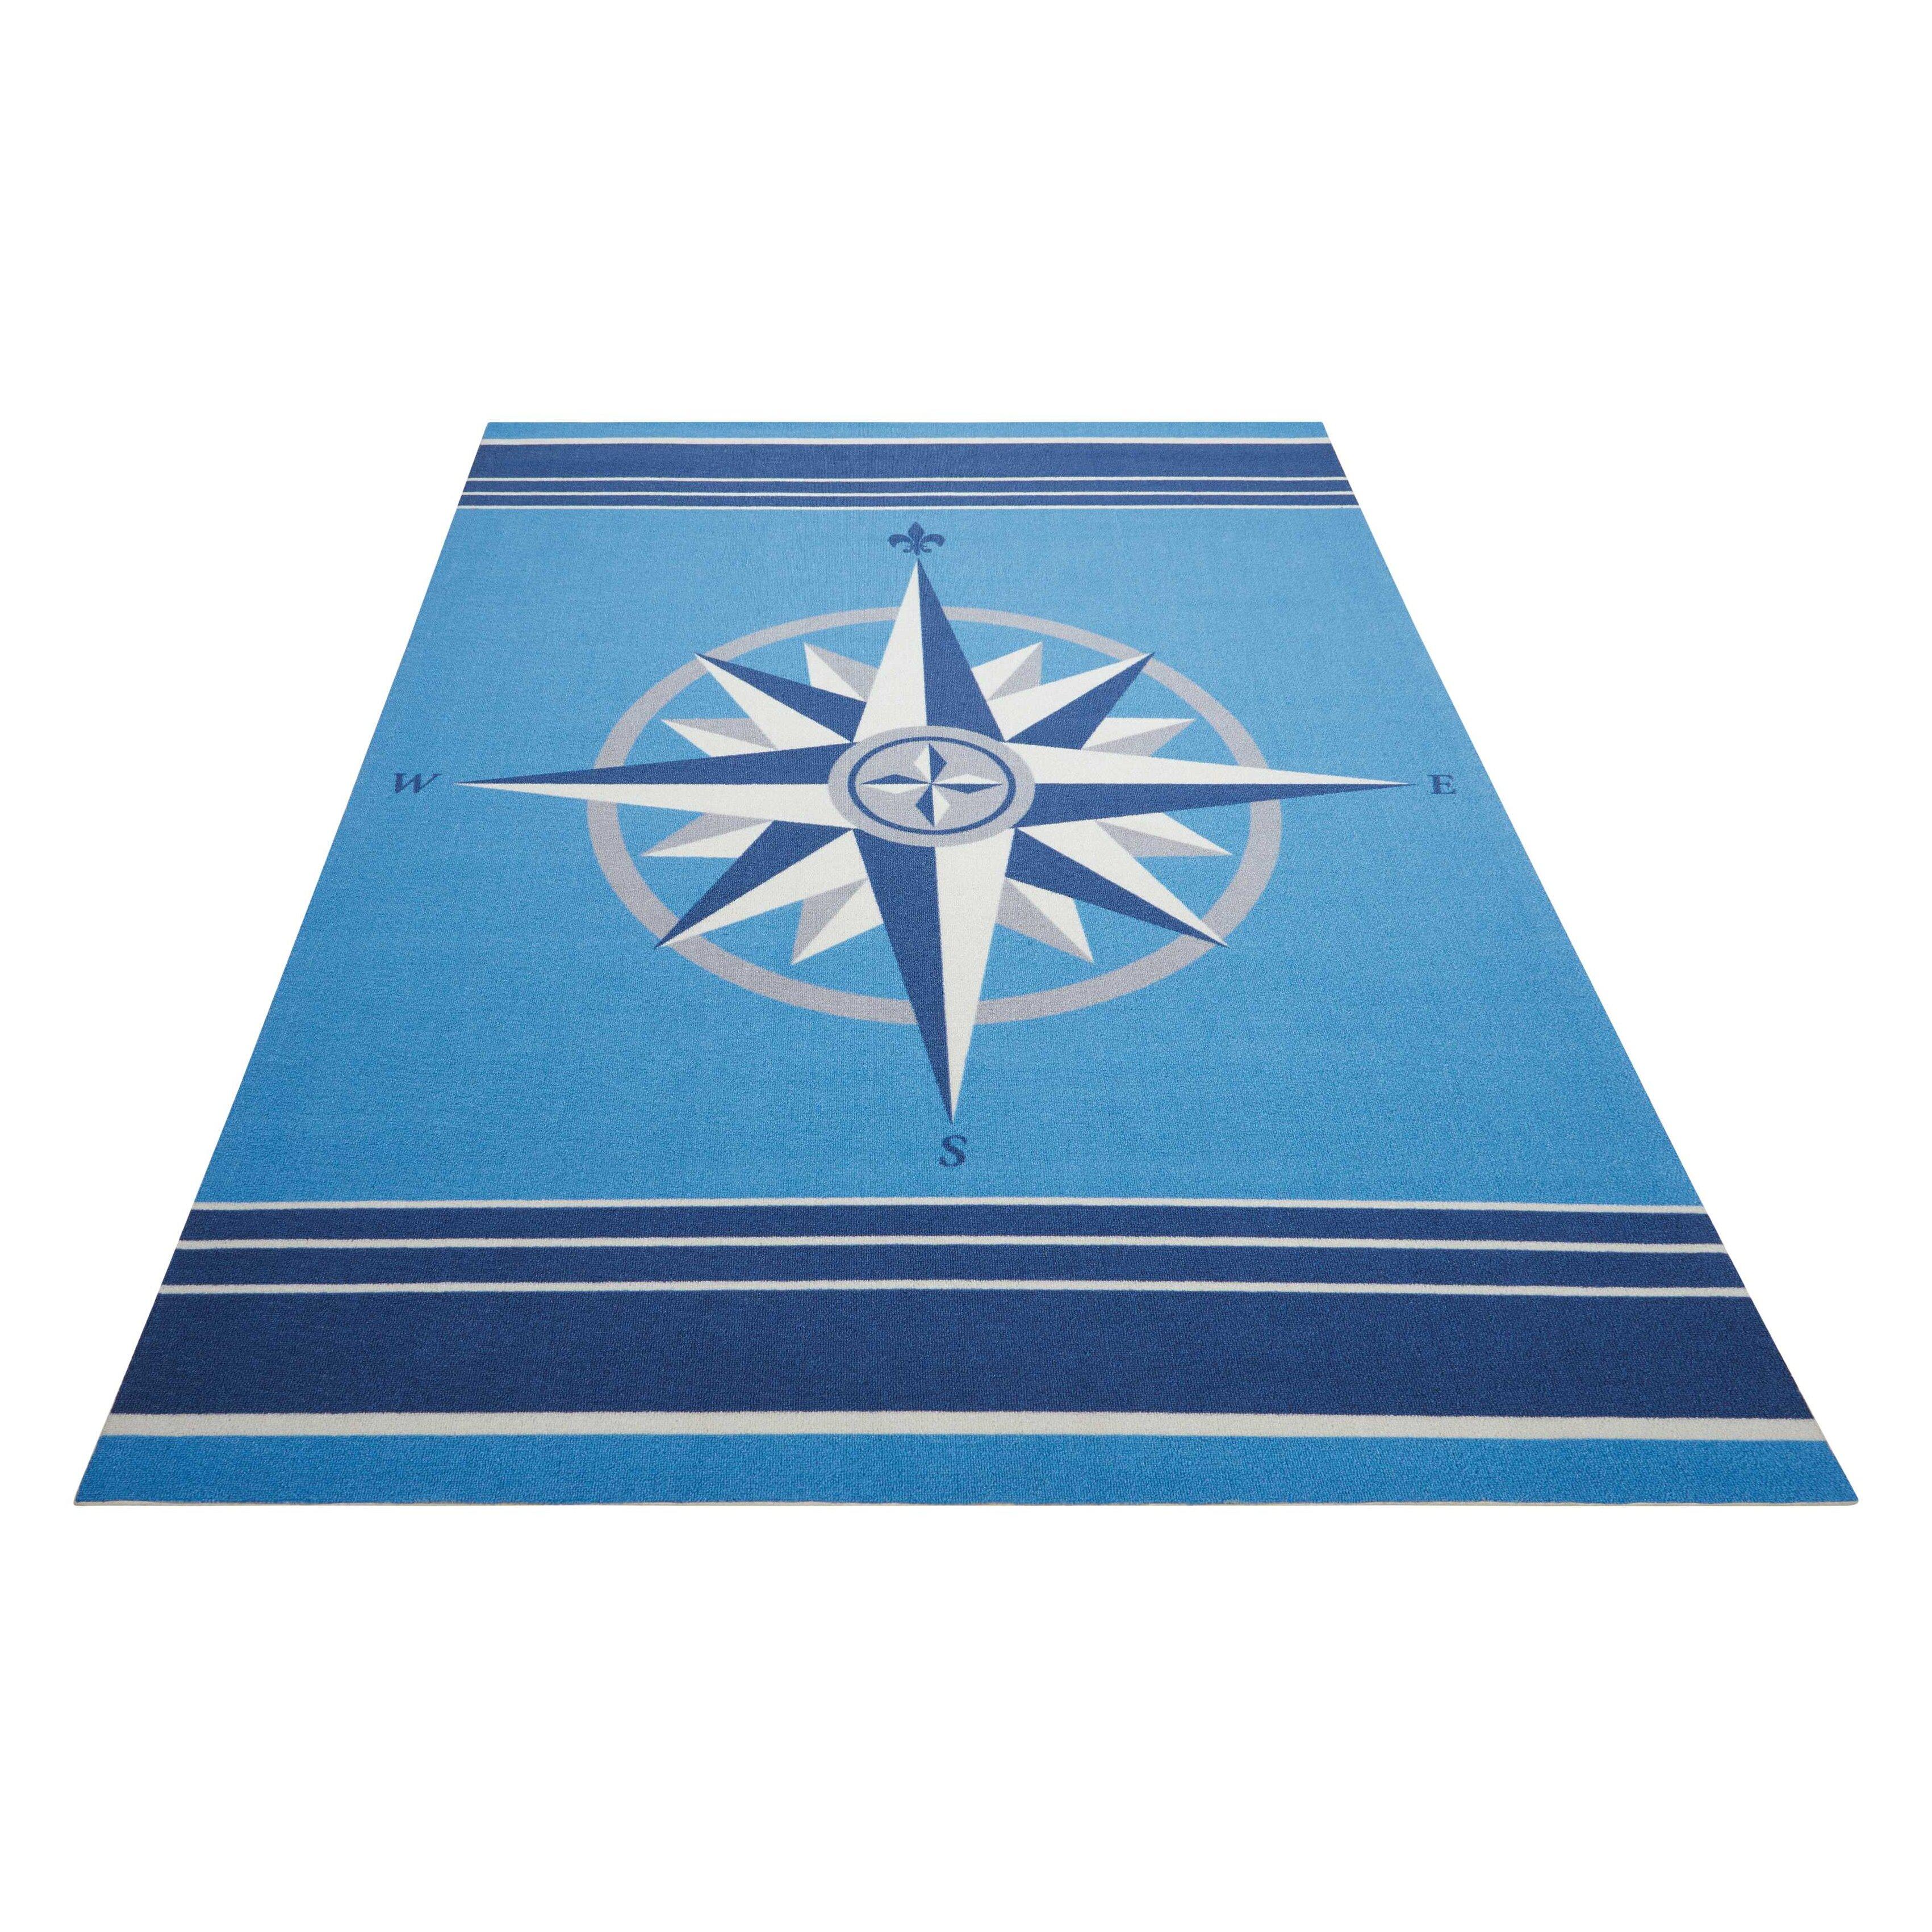 Waverly Sun n' Shade Blue IndoorOutdoor Area Rug & Reviews  Wayfairca # Sun Shower Rug_220024